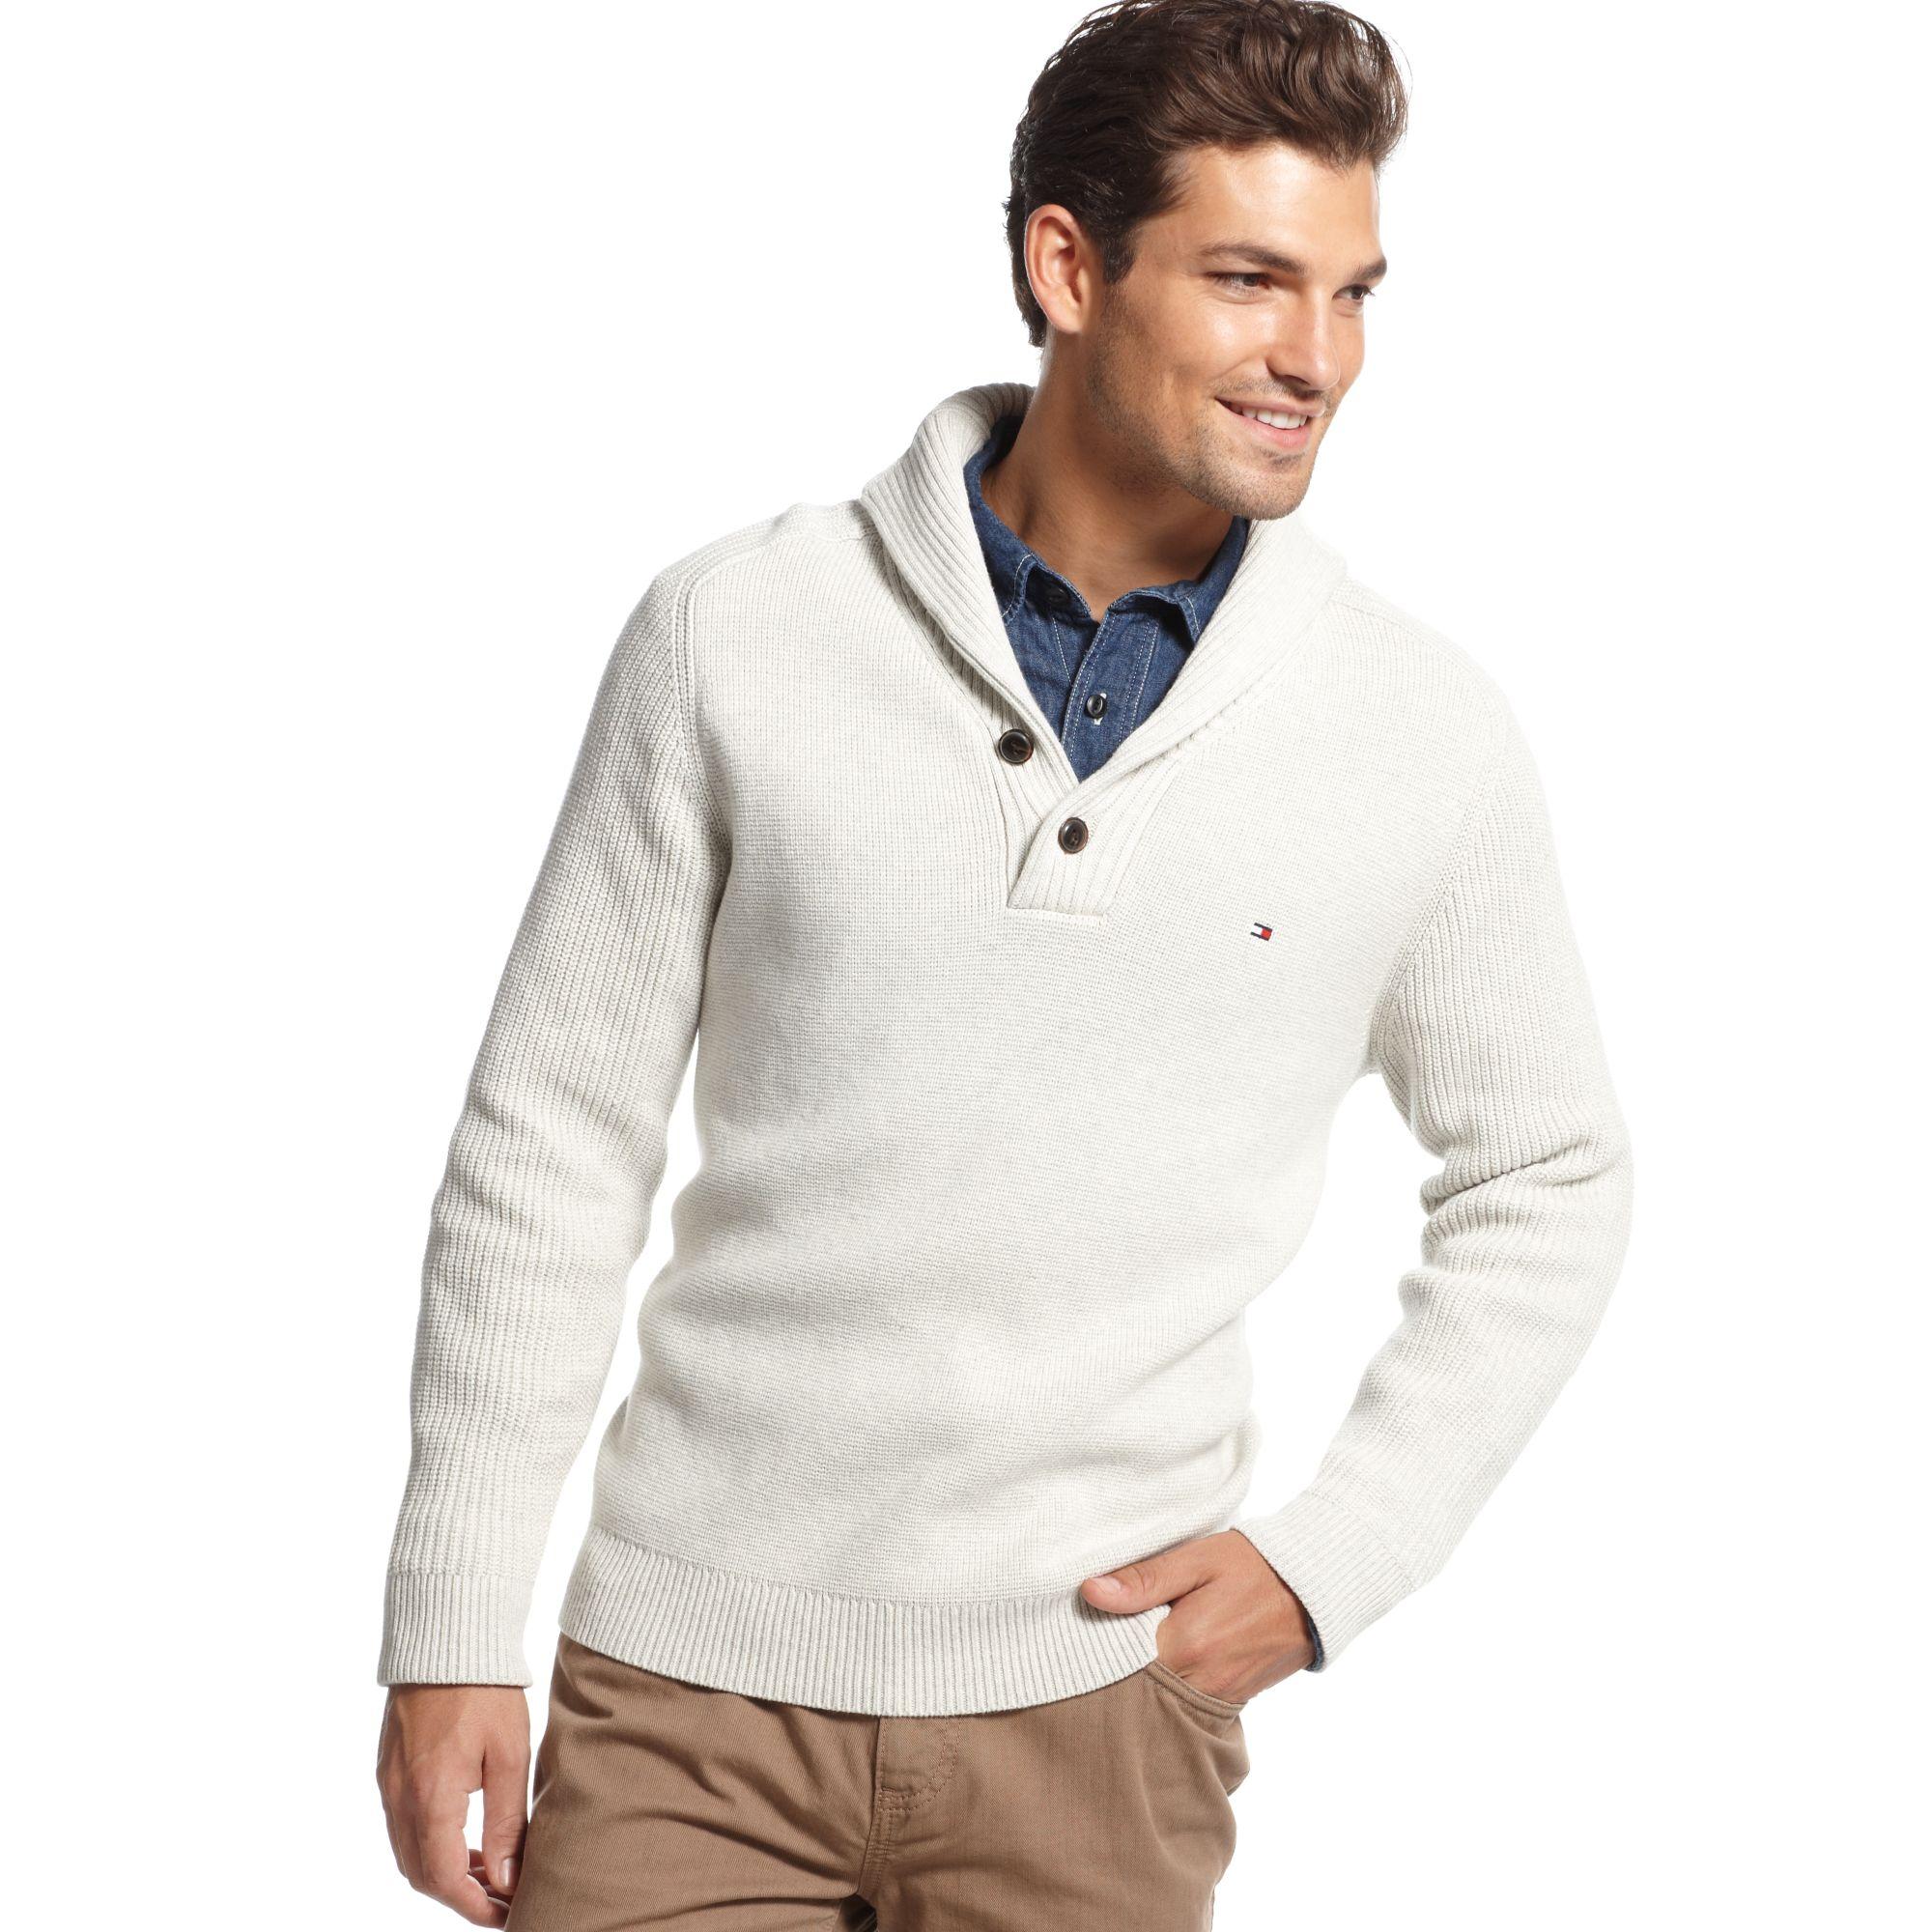 3fd027683ec5 Lyst - Tommy Hilfiger Adler Shawl Collar Sweater in White for Men